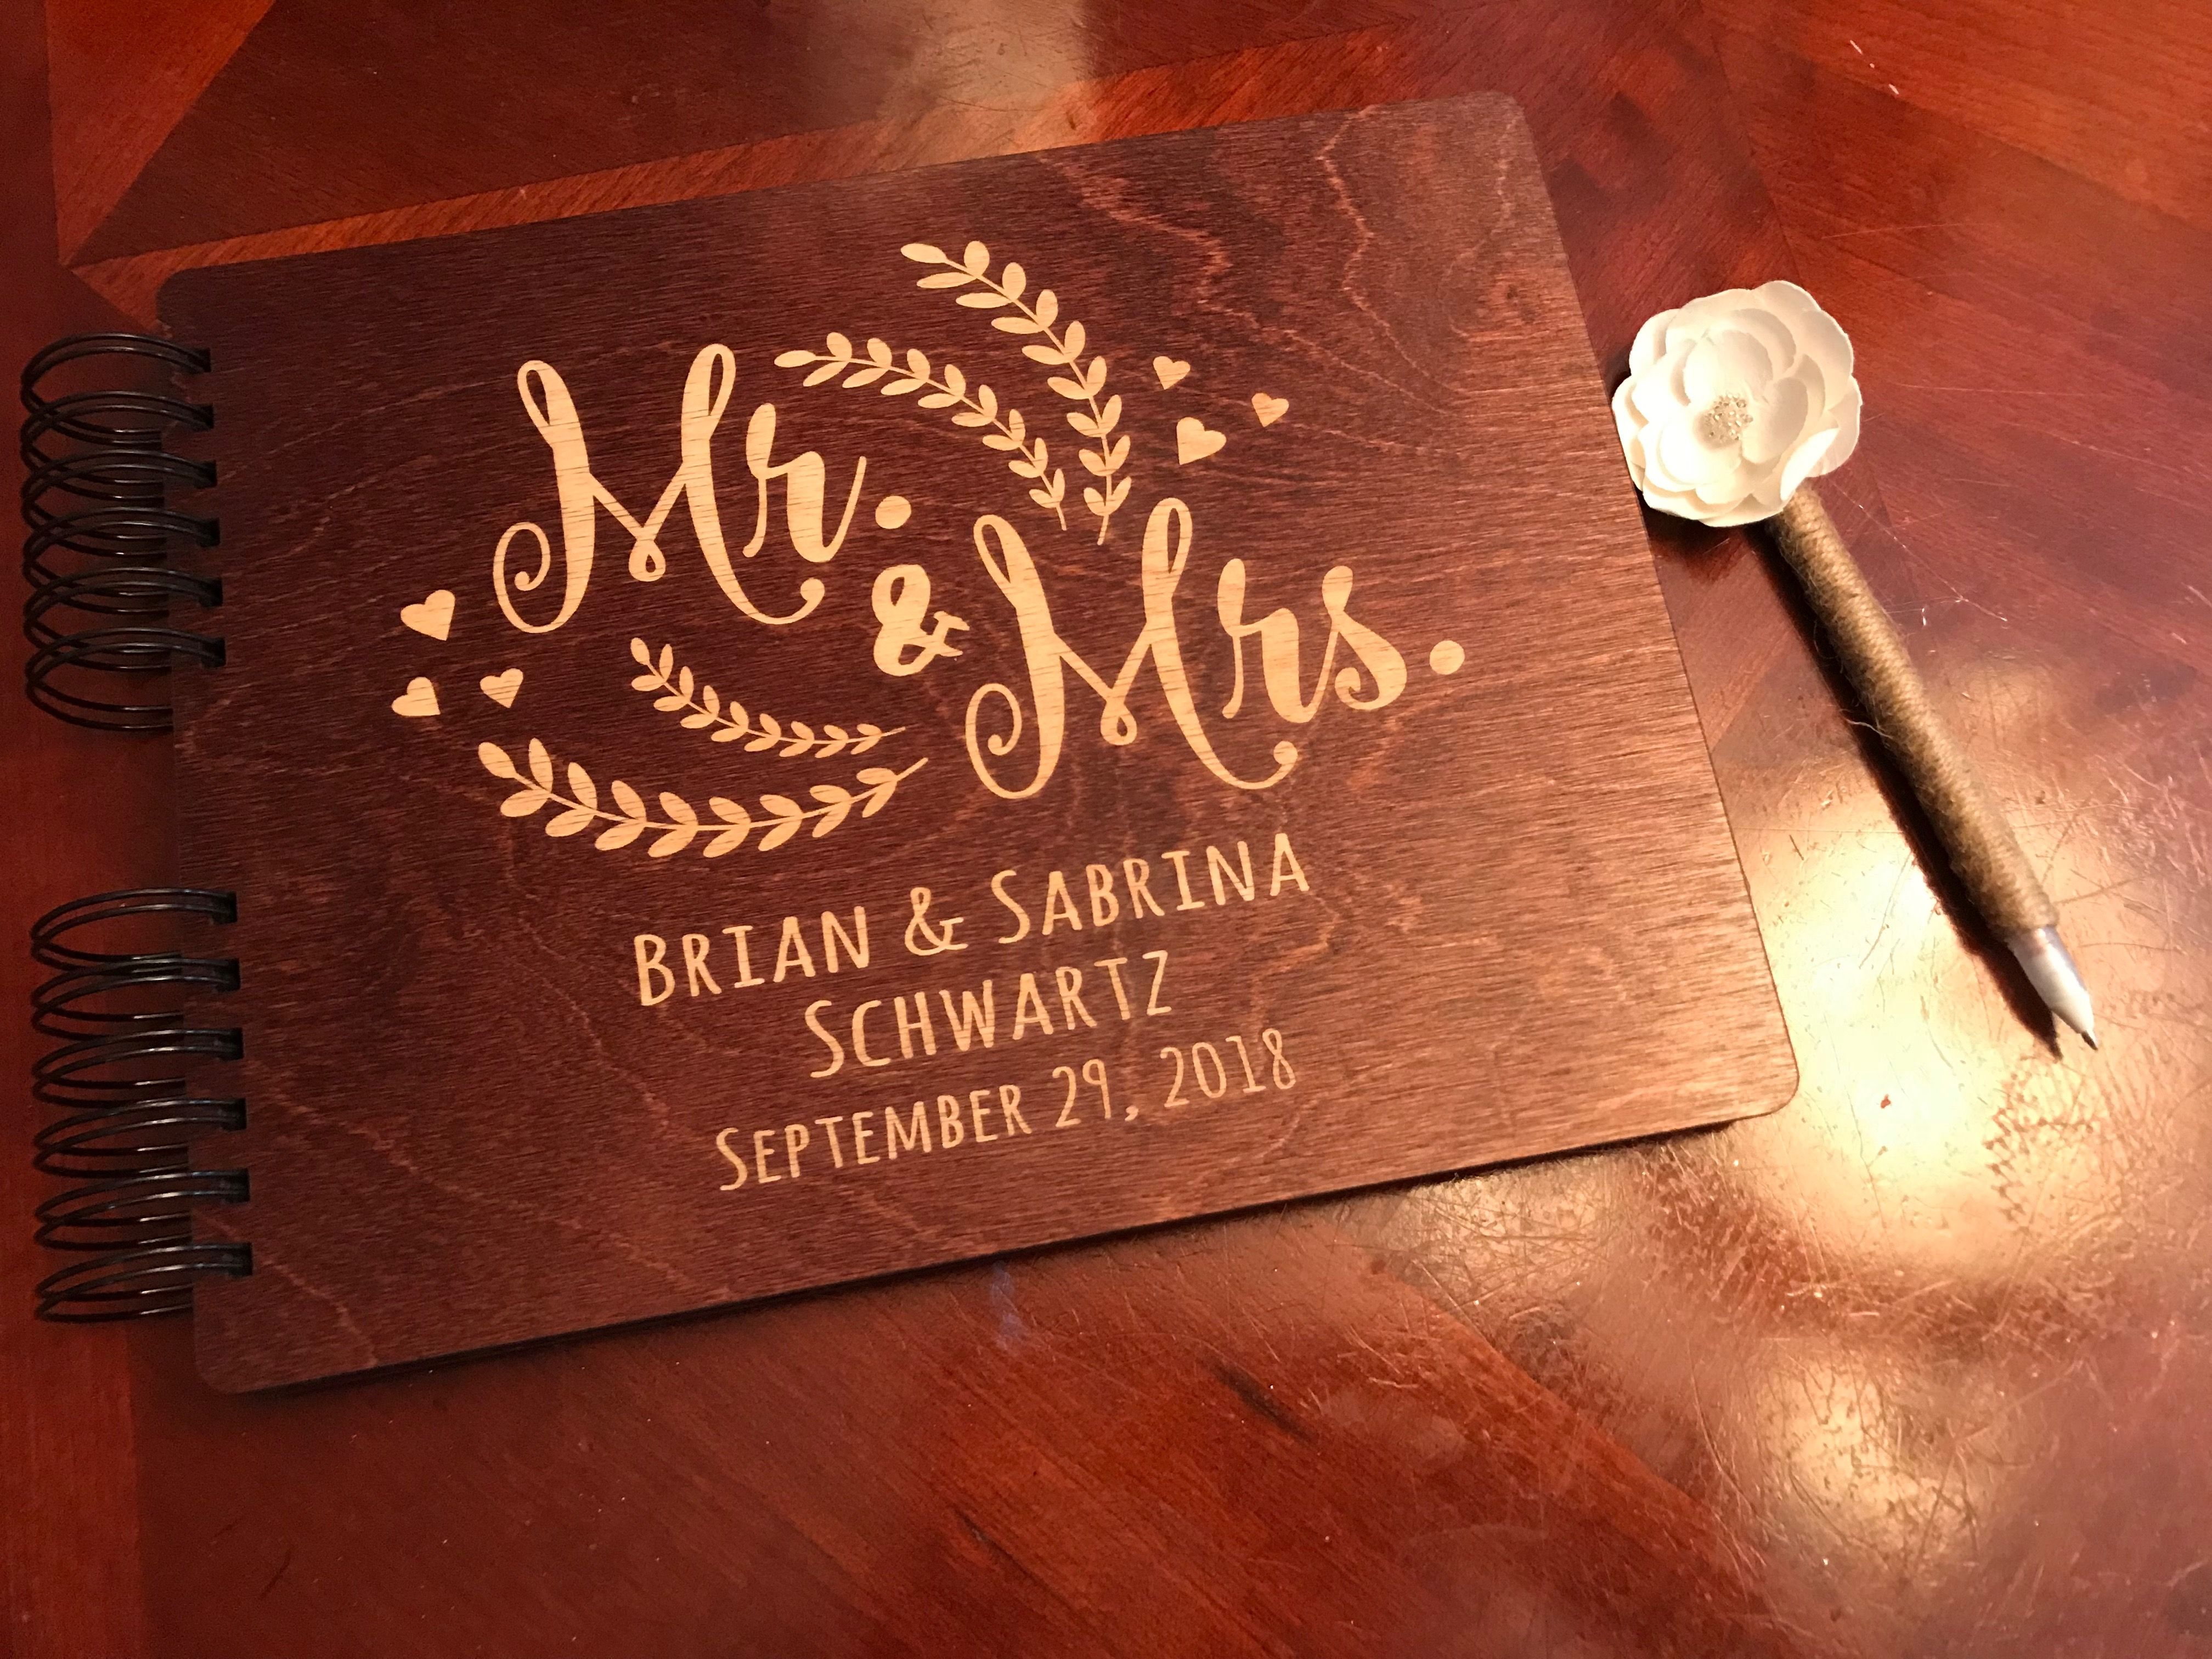 Pin by Sabrina Garcia on Wedding ideasDIY projects  Pinterest